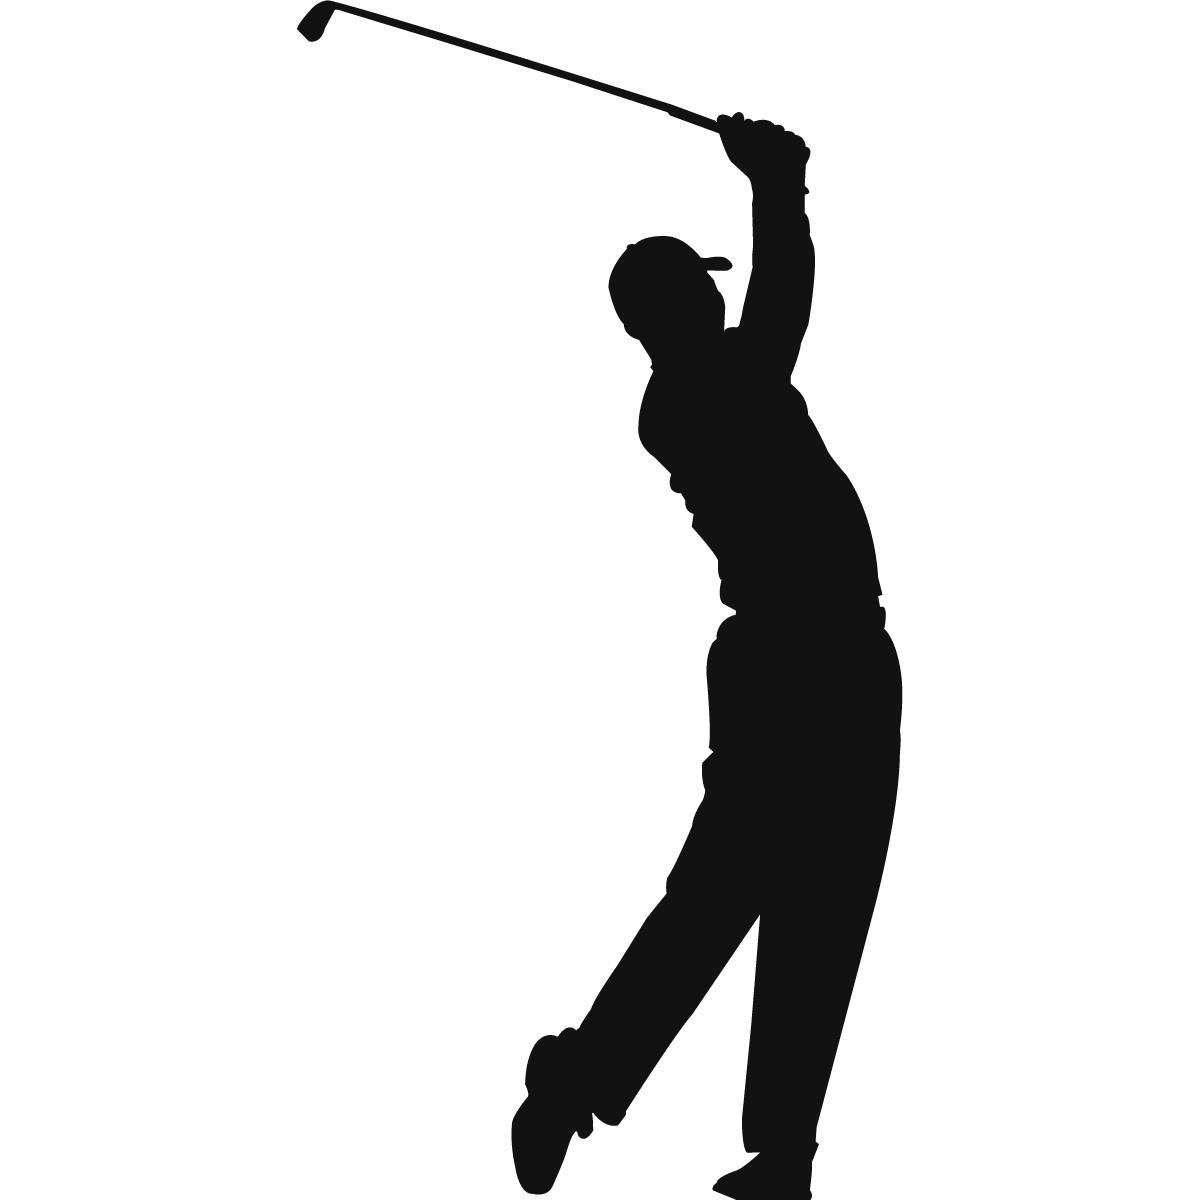 1200x1200 Golf Ball Clip Art Free Clipart Images